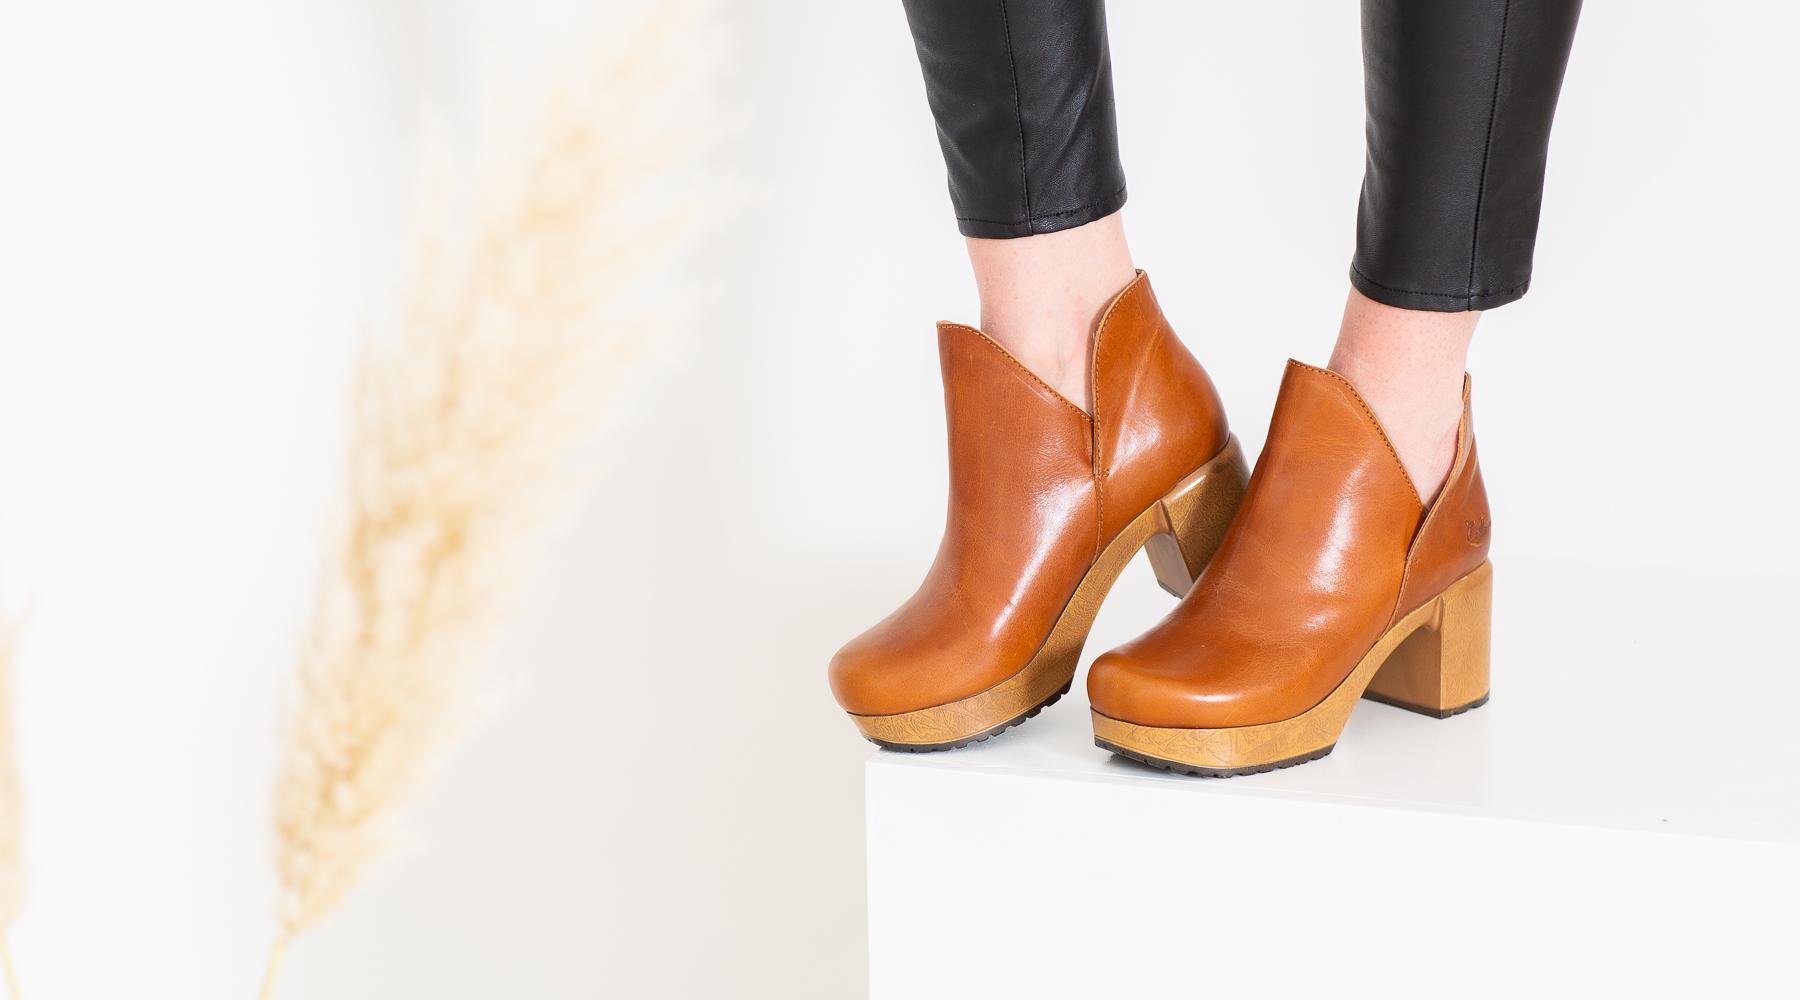 Stockholm Design Group | Shoes, Sandals, Boots